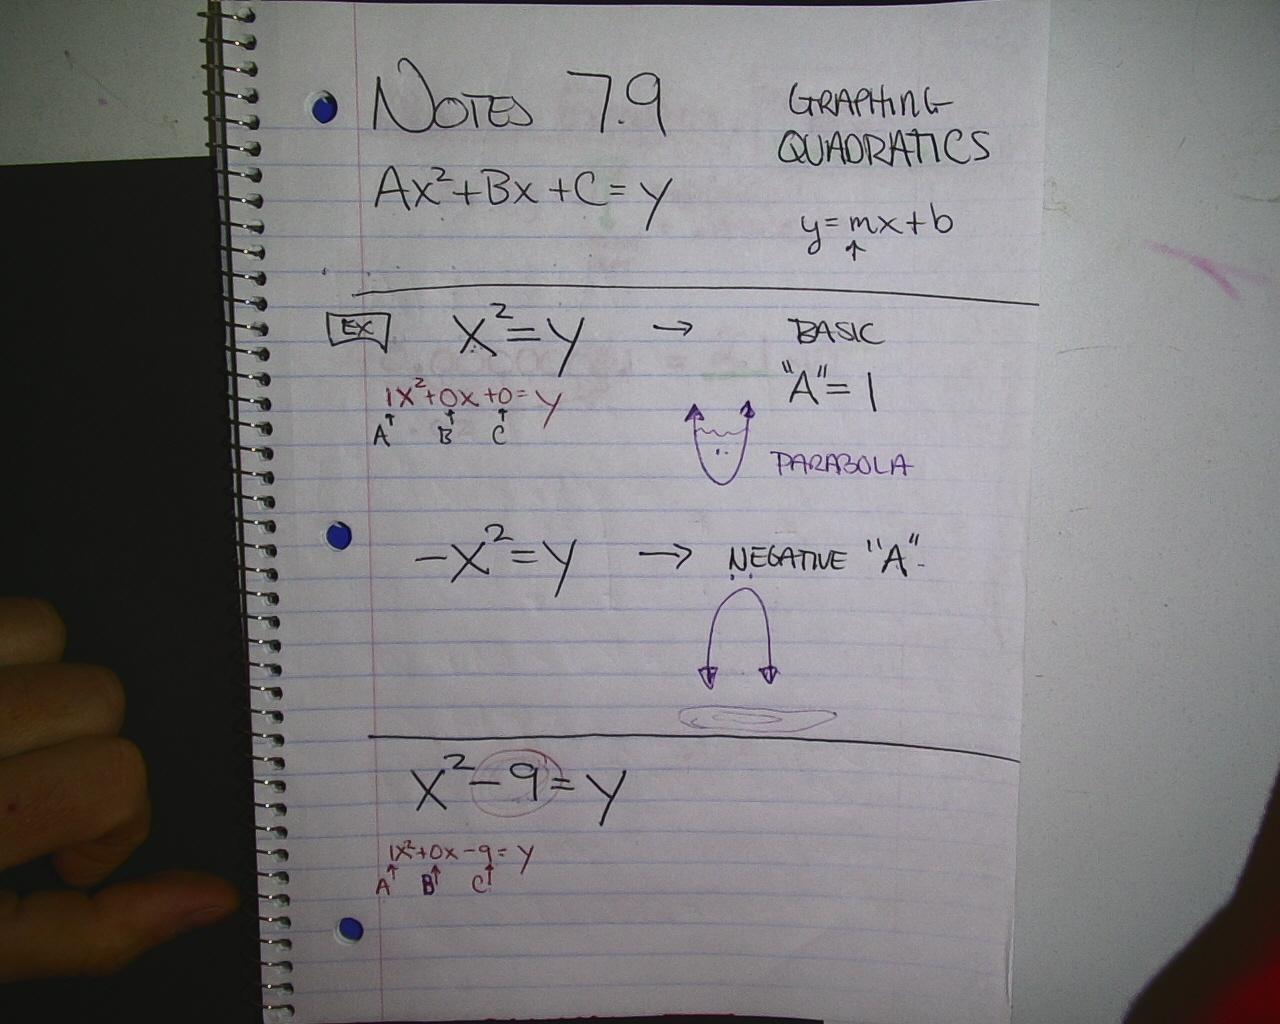 Mr Brzenski S Math Class Algebra Notes 7 9 Graphing